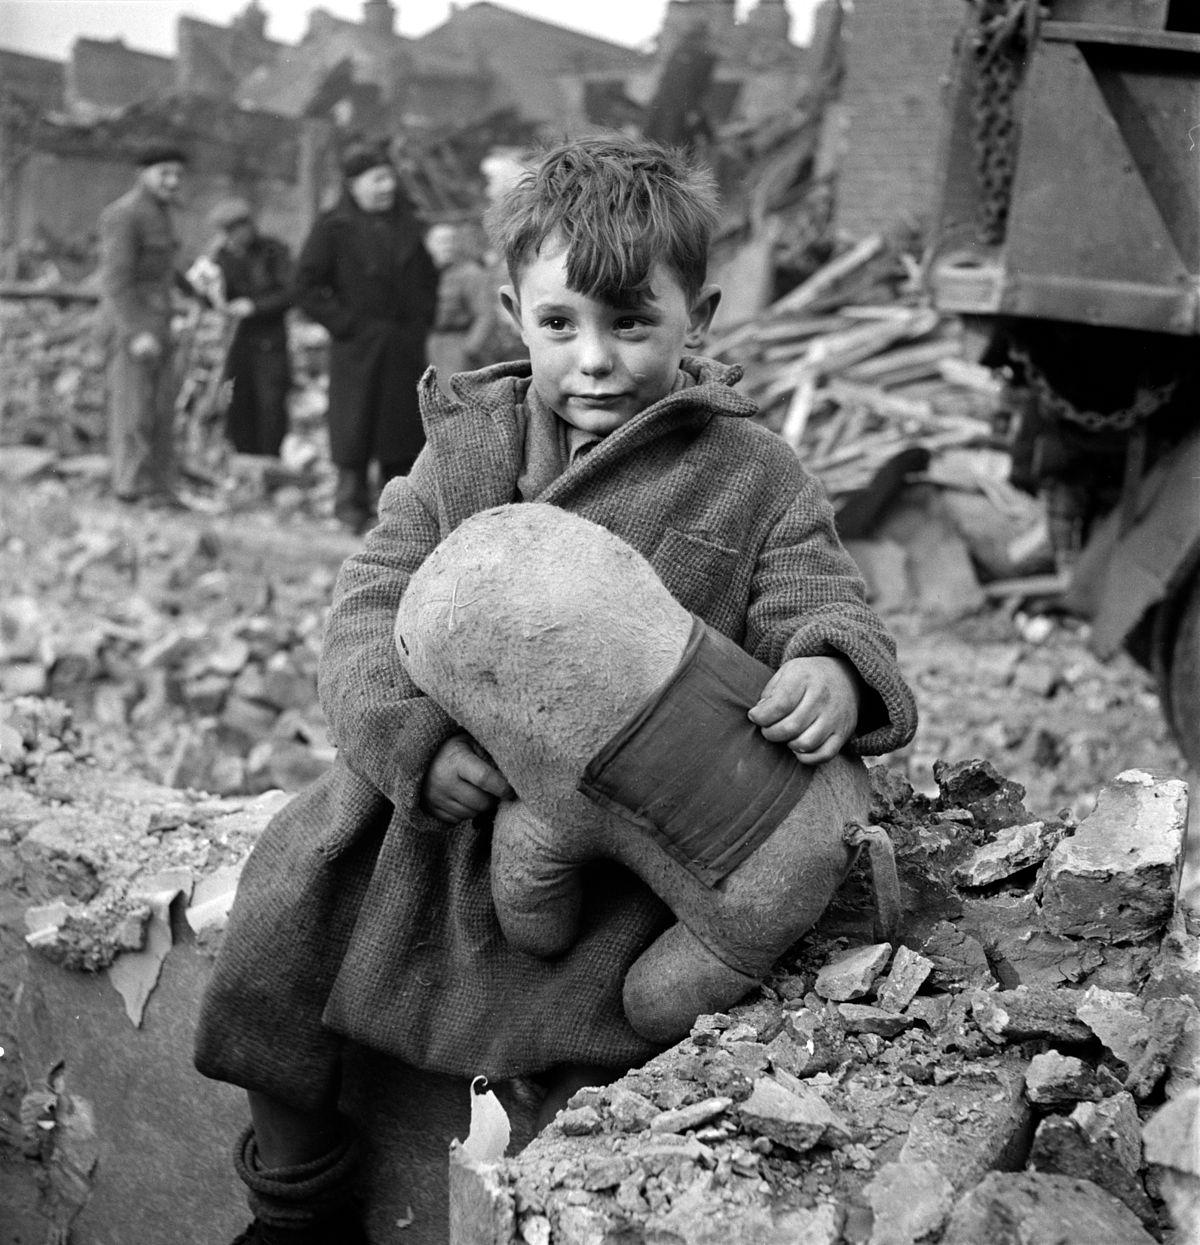 File:Toni Frissell, Abandoned Boy, London, 1945.jpg